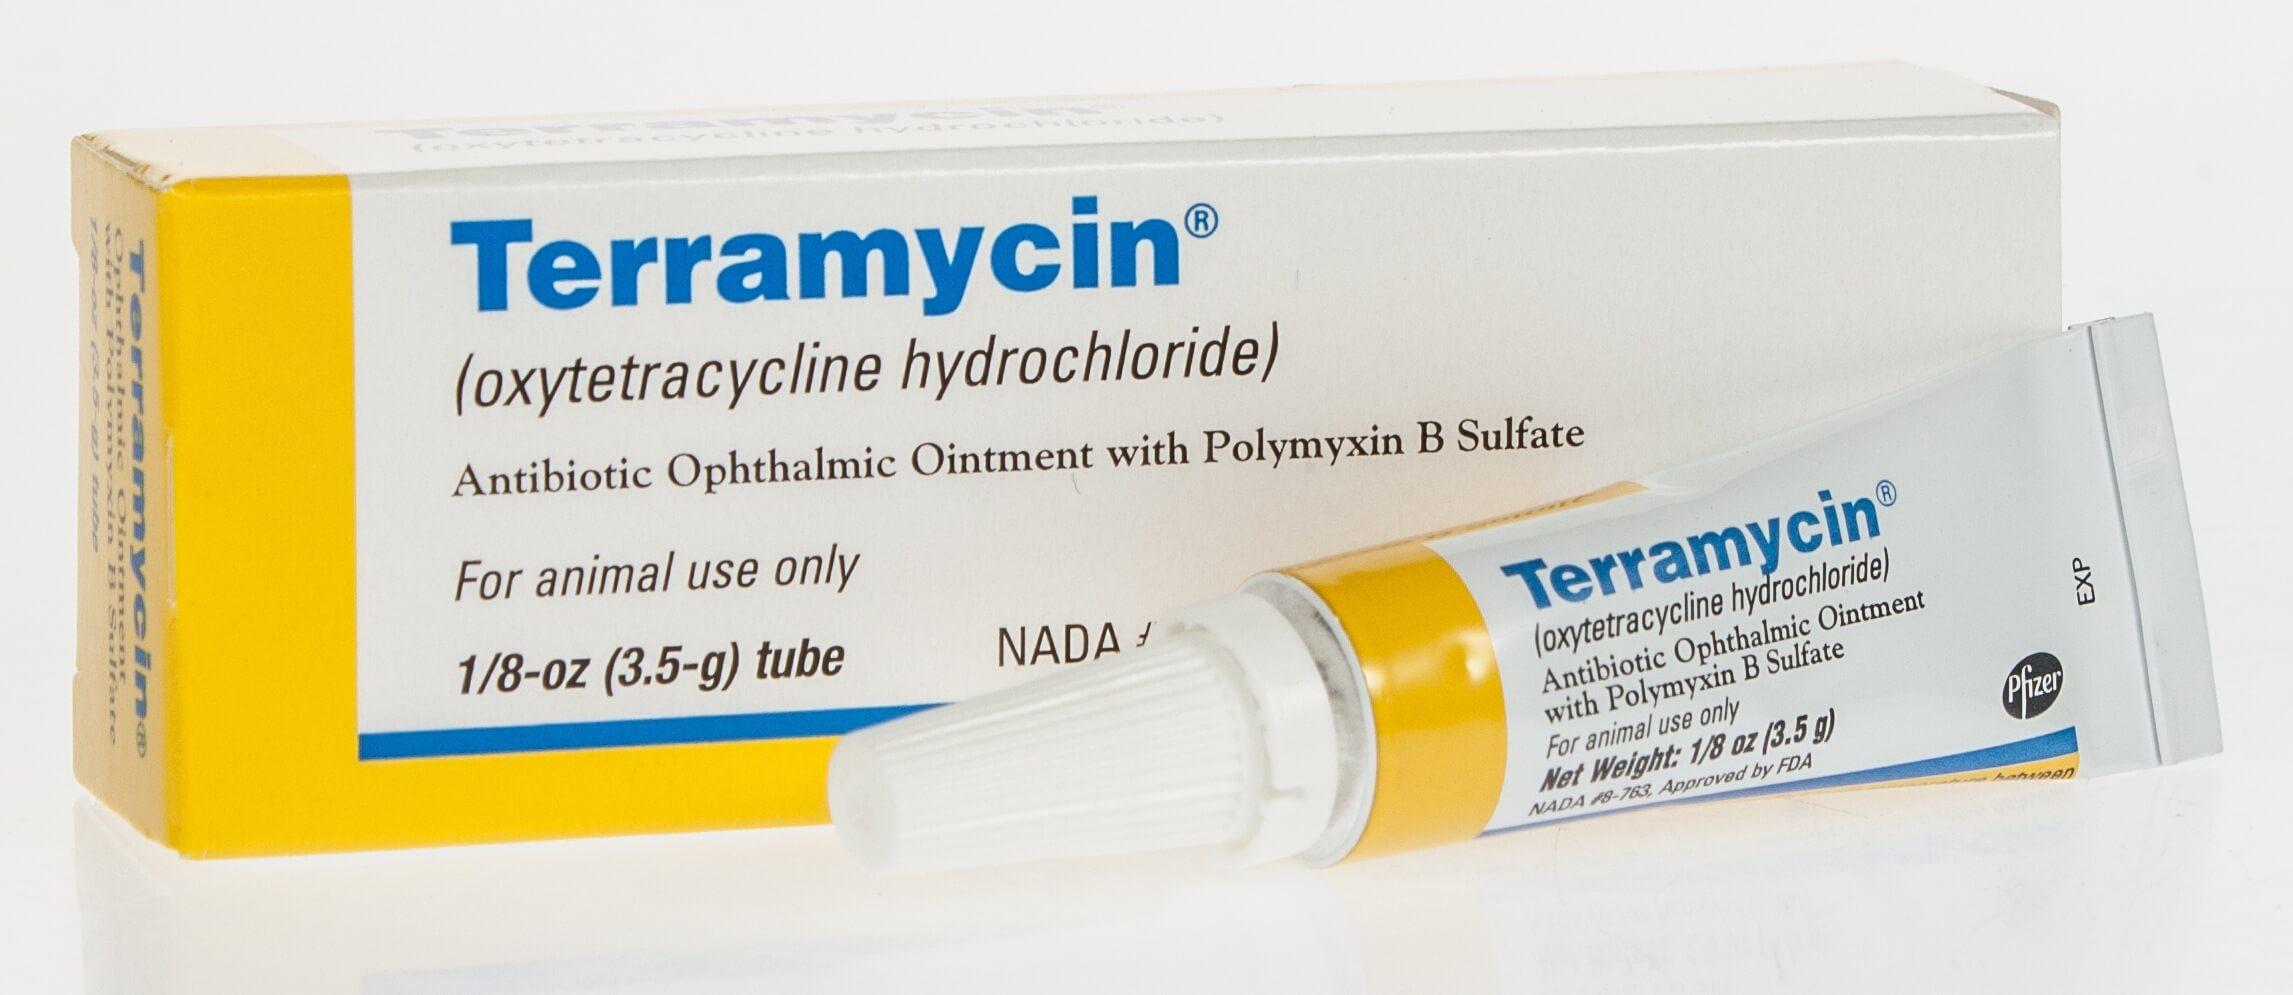 Terramycin Ophthalmic Ointment